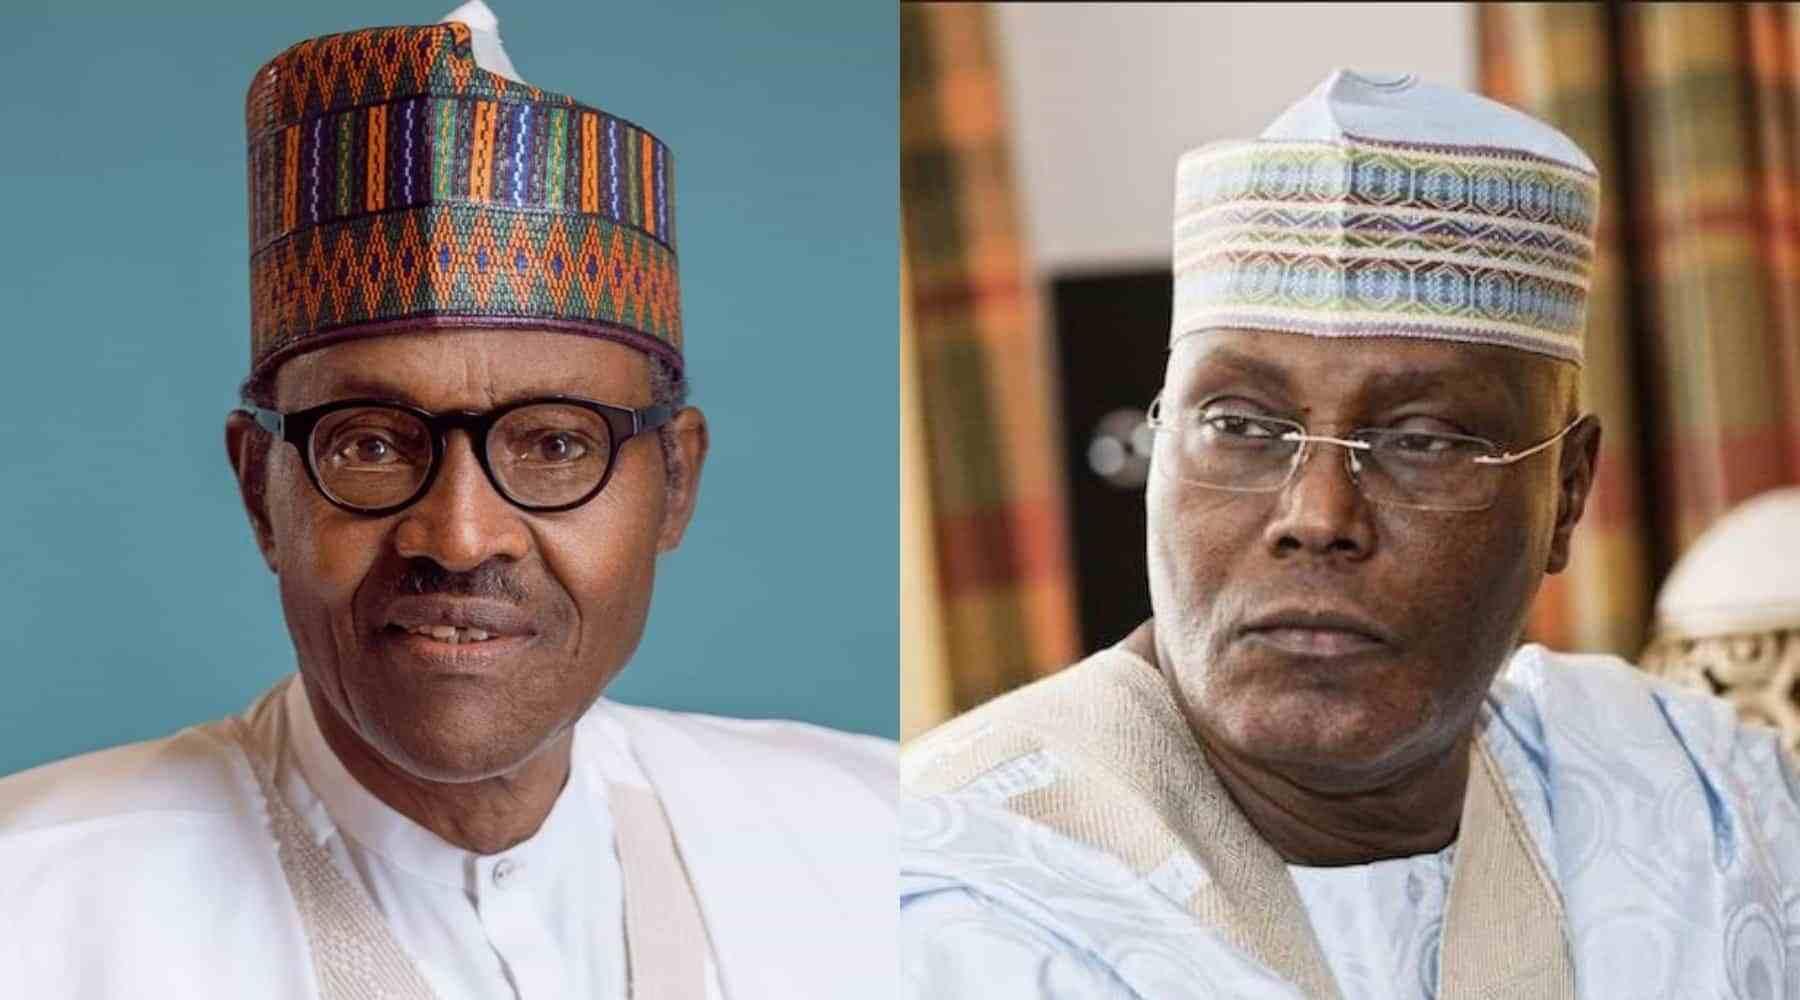 Nigerian court upholds President Muhammadu Buhari's February election win